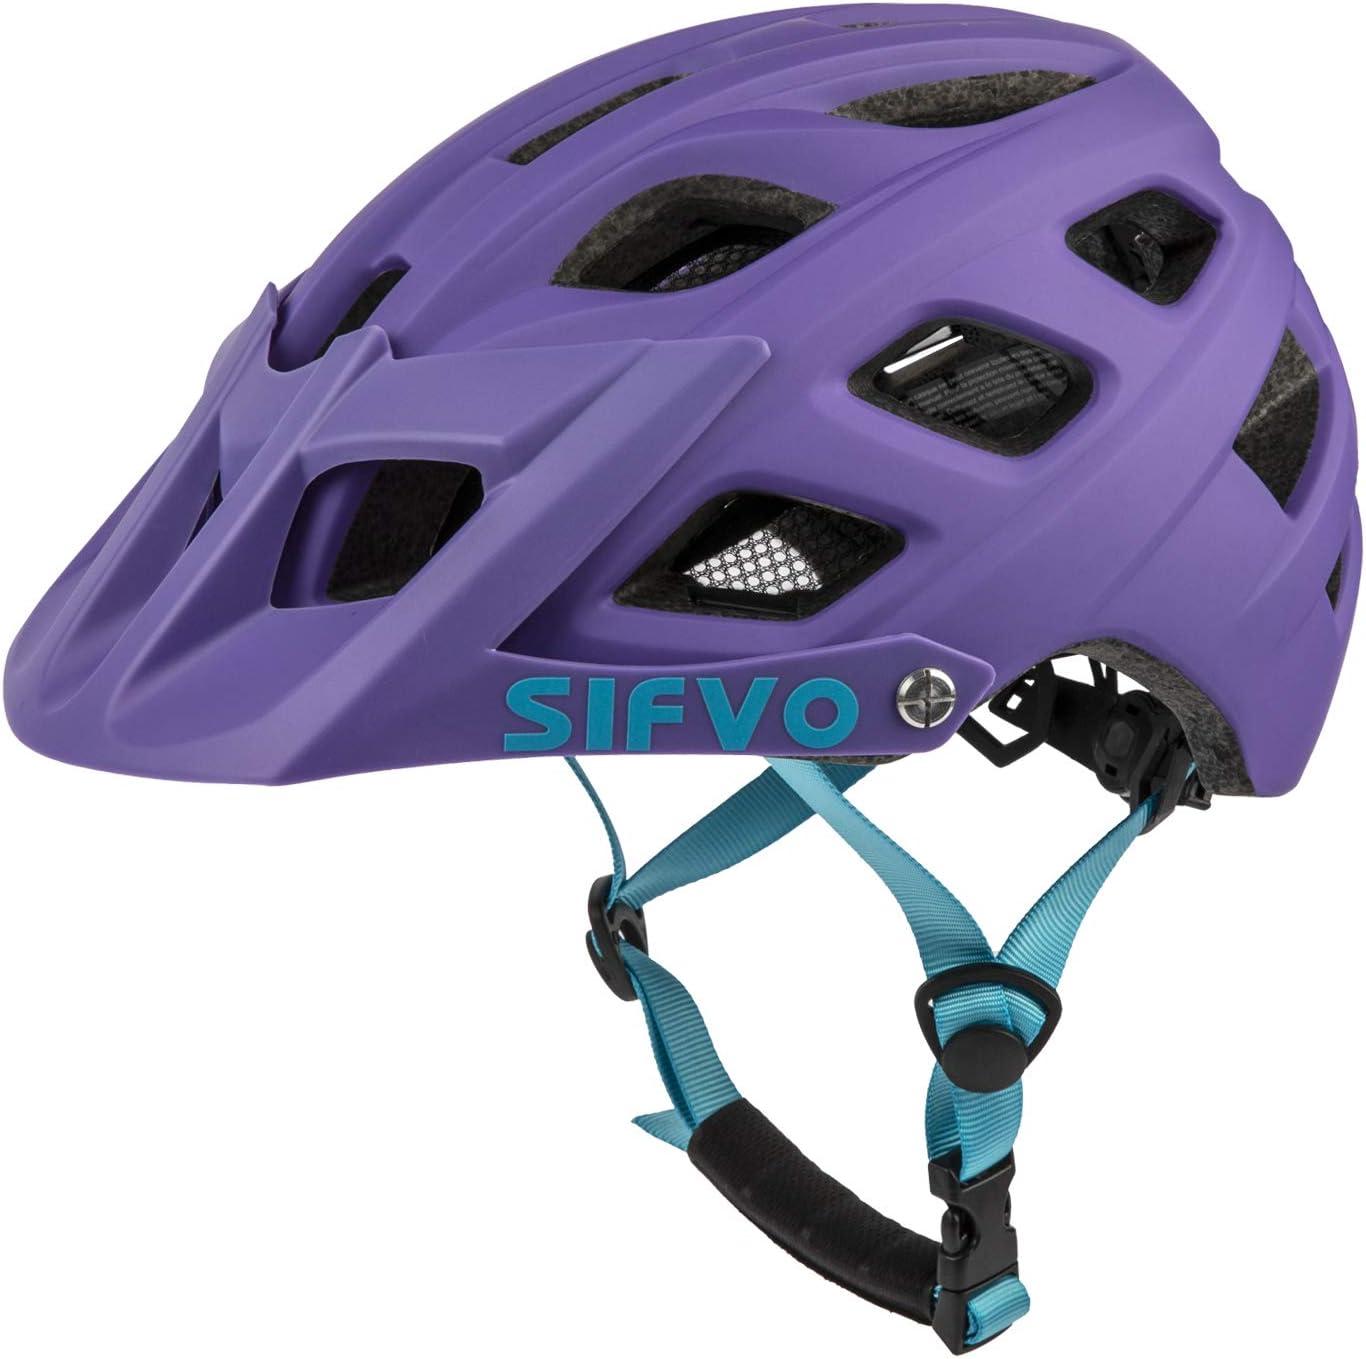 SIFVO Youth Bike Helmet MTB Bicycle Cycling Helmet ,Universal Youth (55-58 cm)